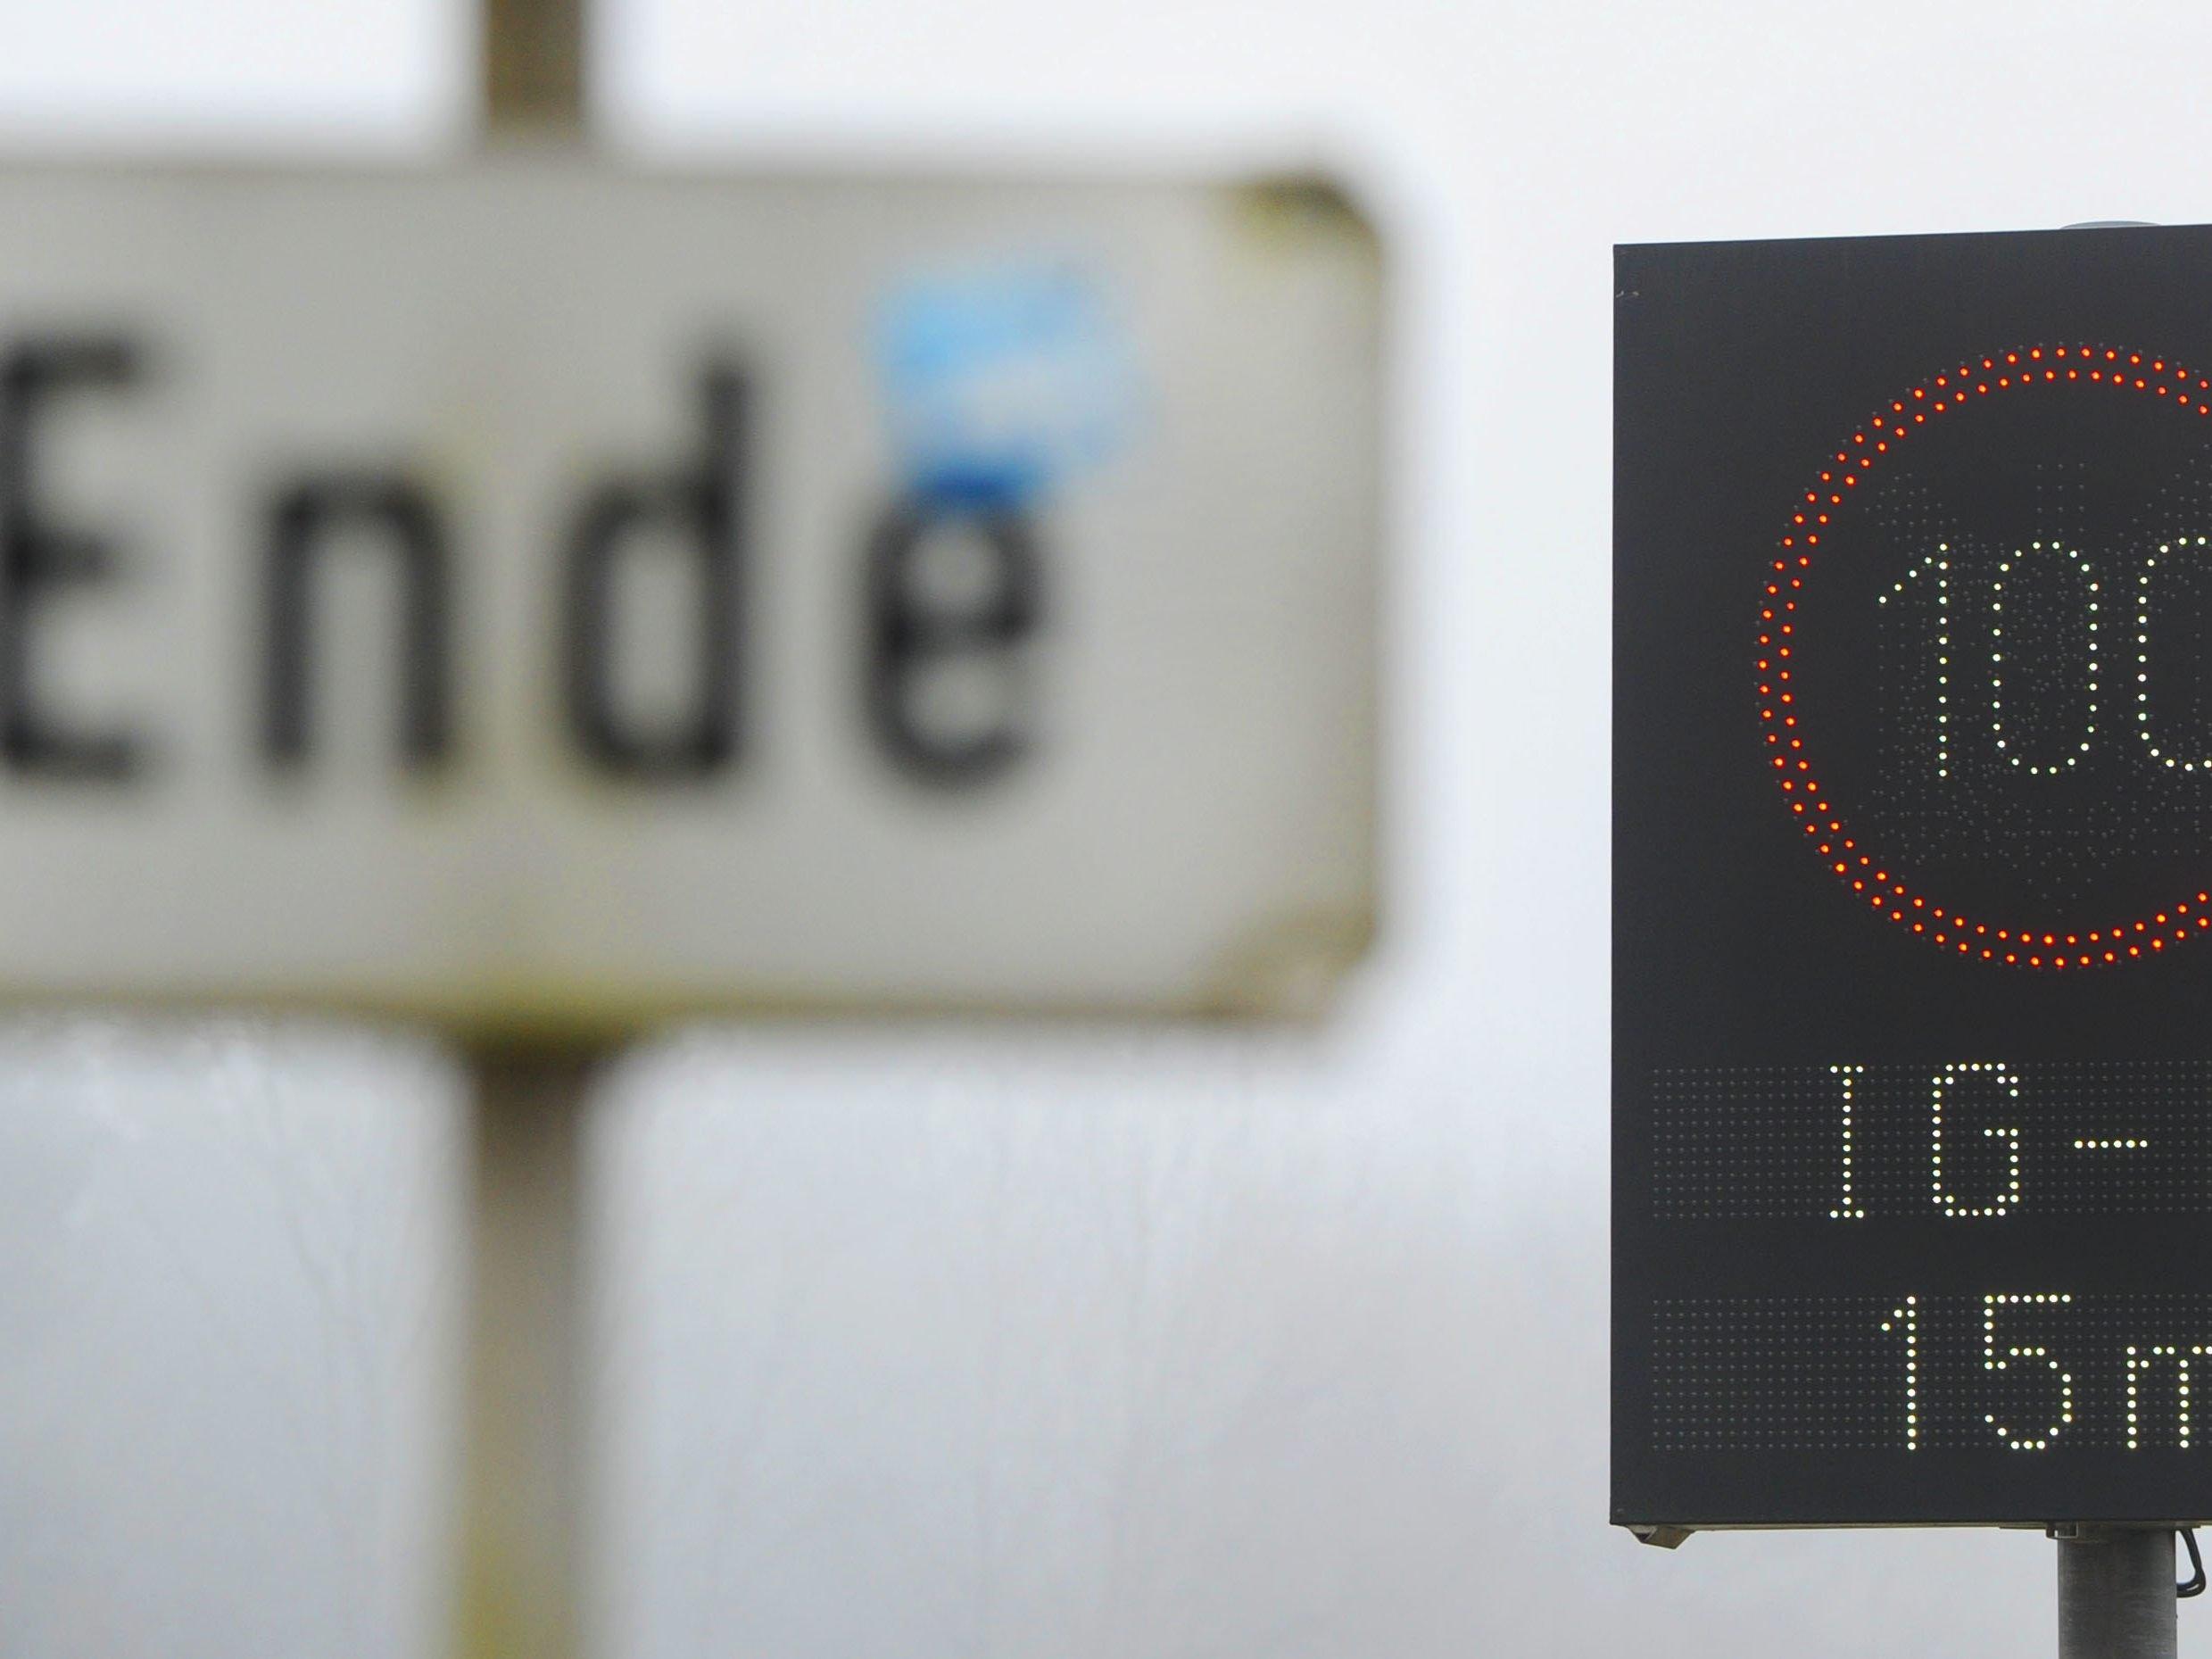 Köstinger will Ausnahme für E-Autos bei IG-Luft-Tempolimits ...